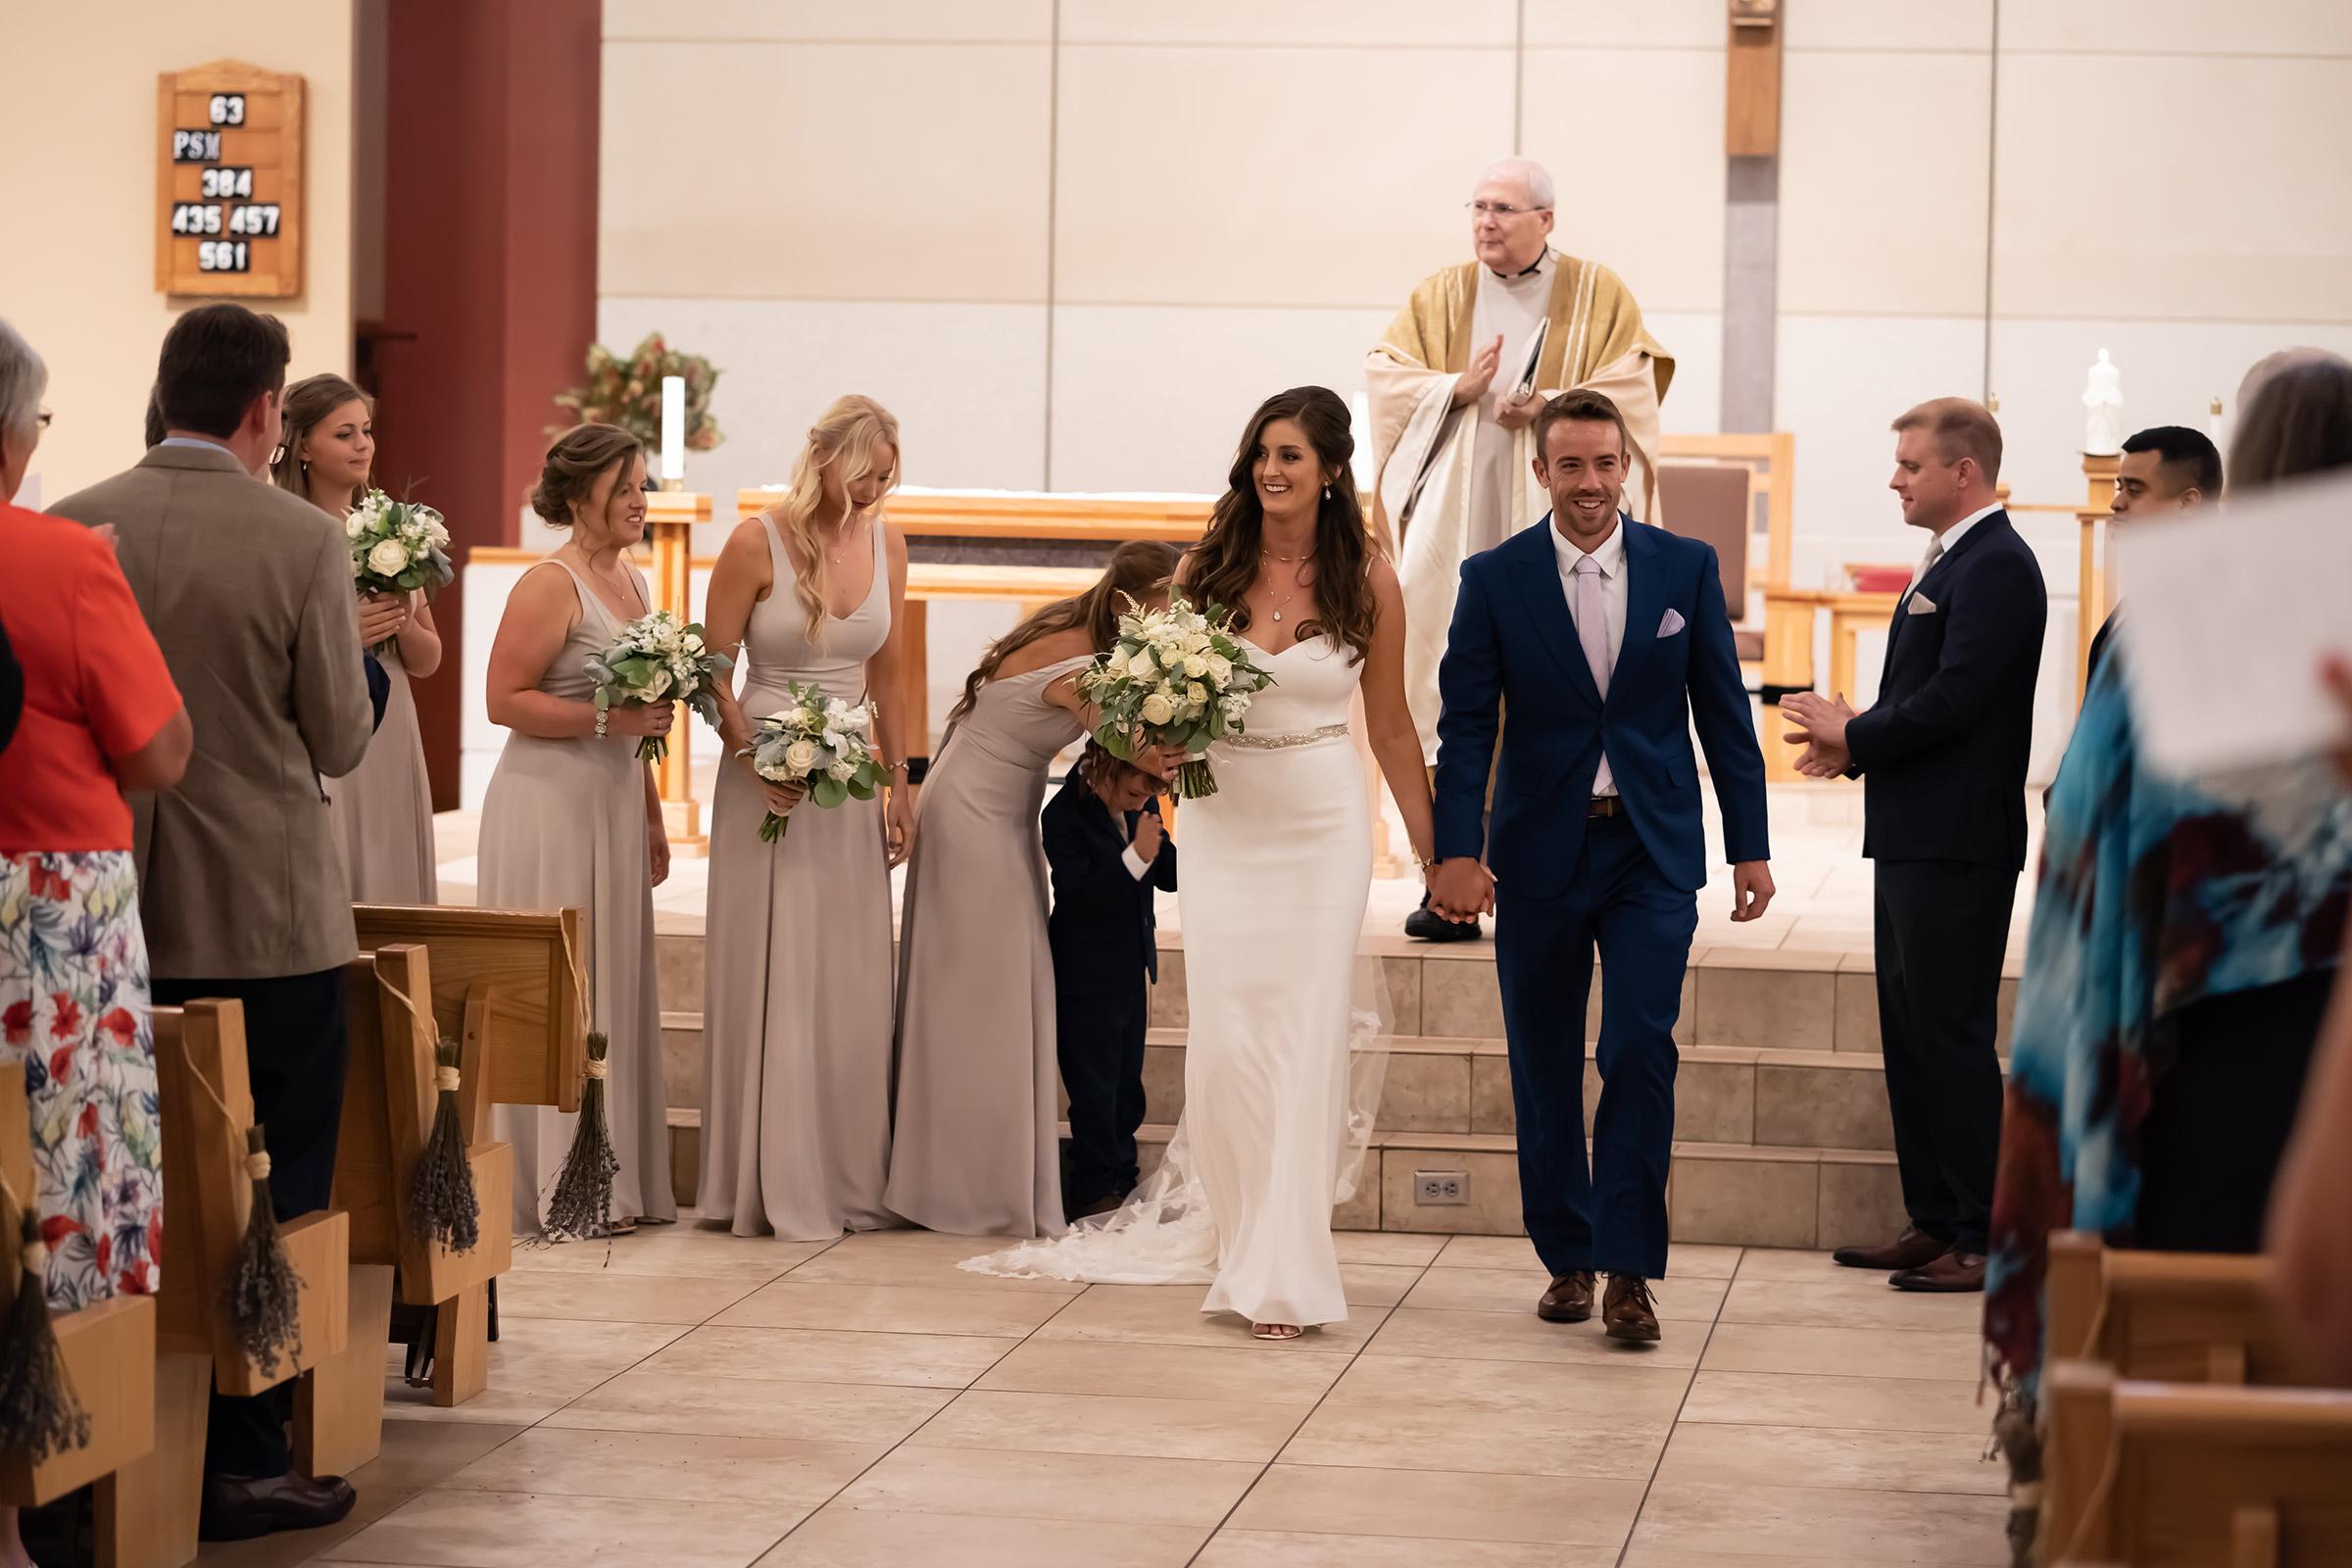 mr-mrs-hull-bride-groom-walking-down-aisle-desmoines-iowa-raelyn-ramey-photography-348.jpg